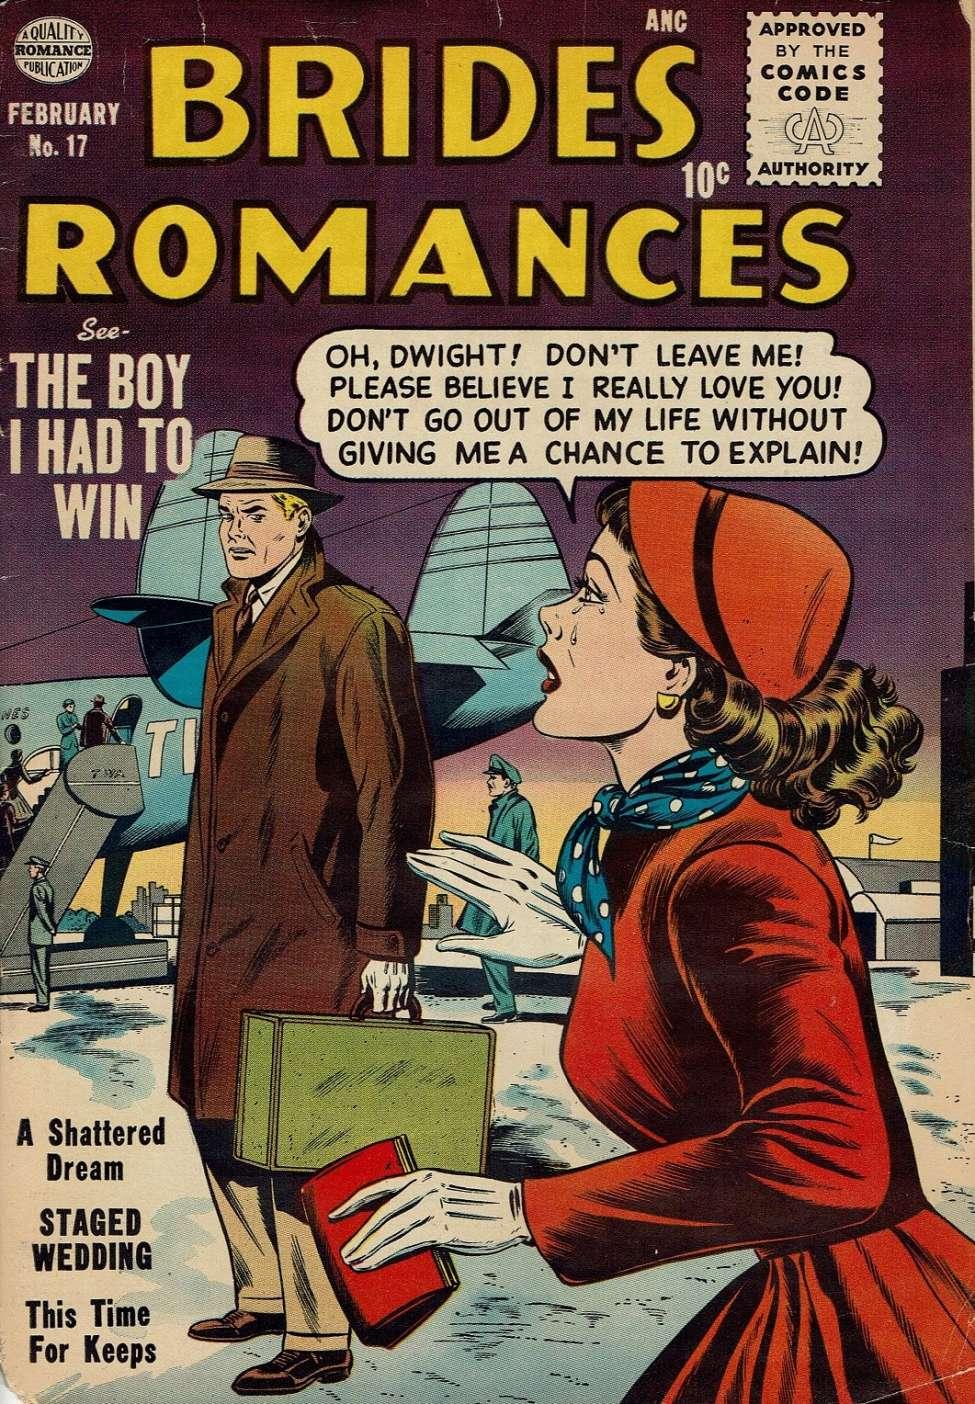 Comic Book Cover For Brides Romances #17